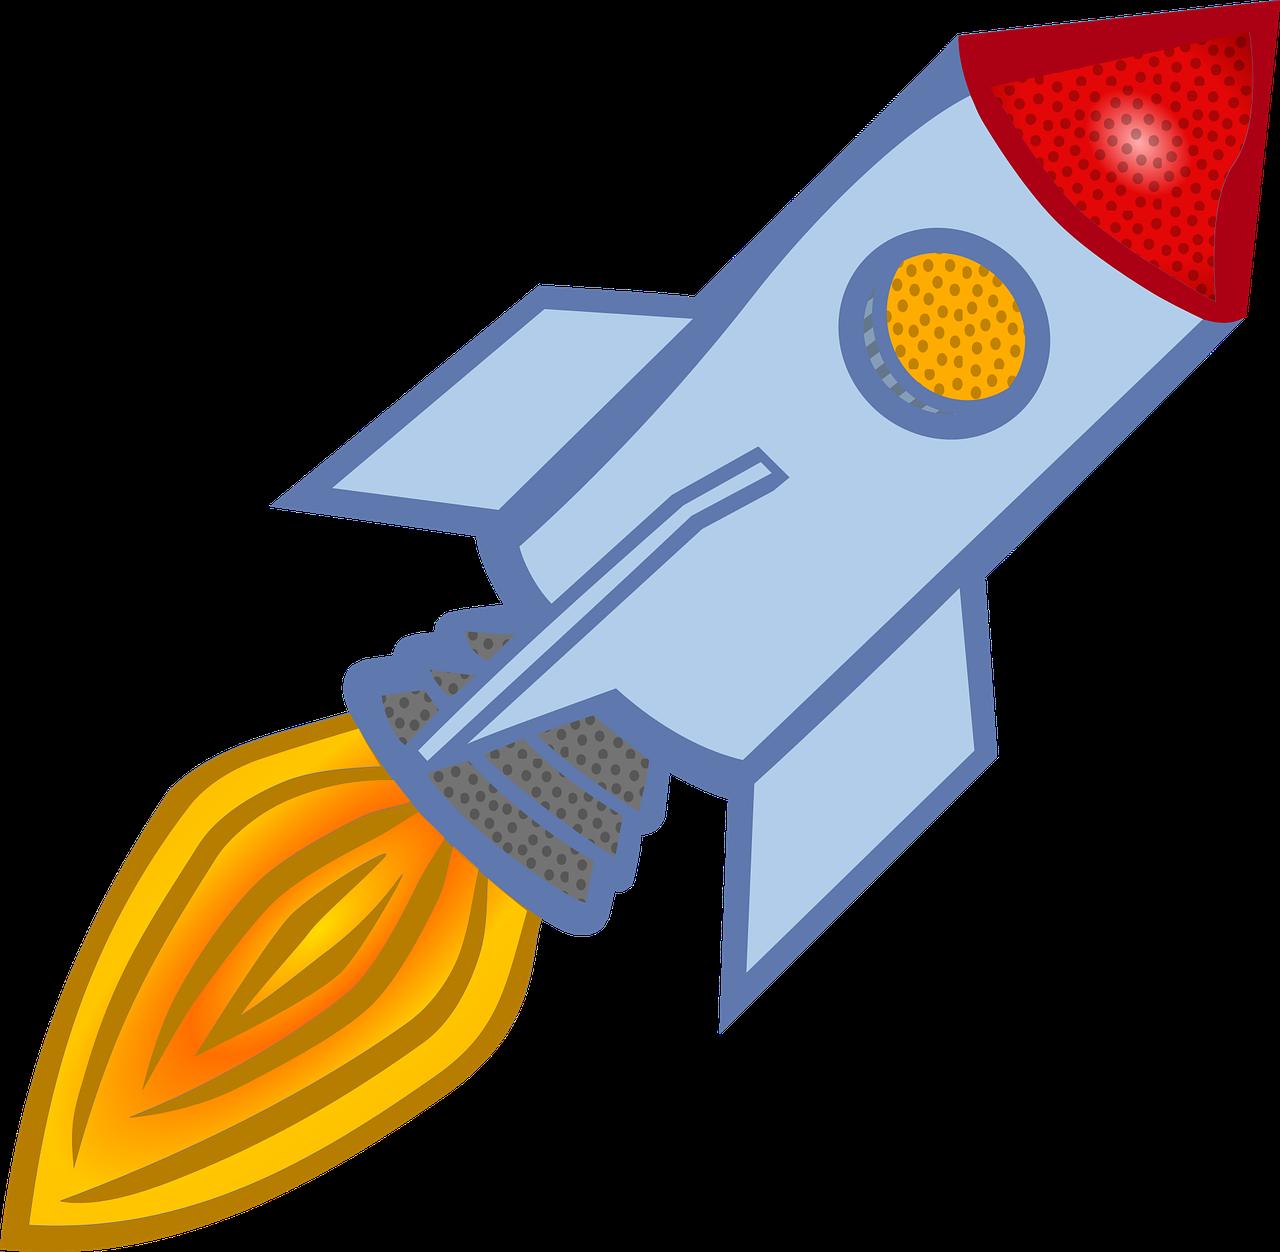 Travel rocket vehicle astronaut. Galaxy clipart space flight